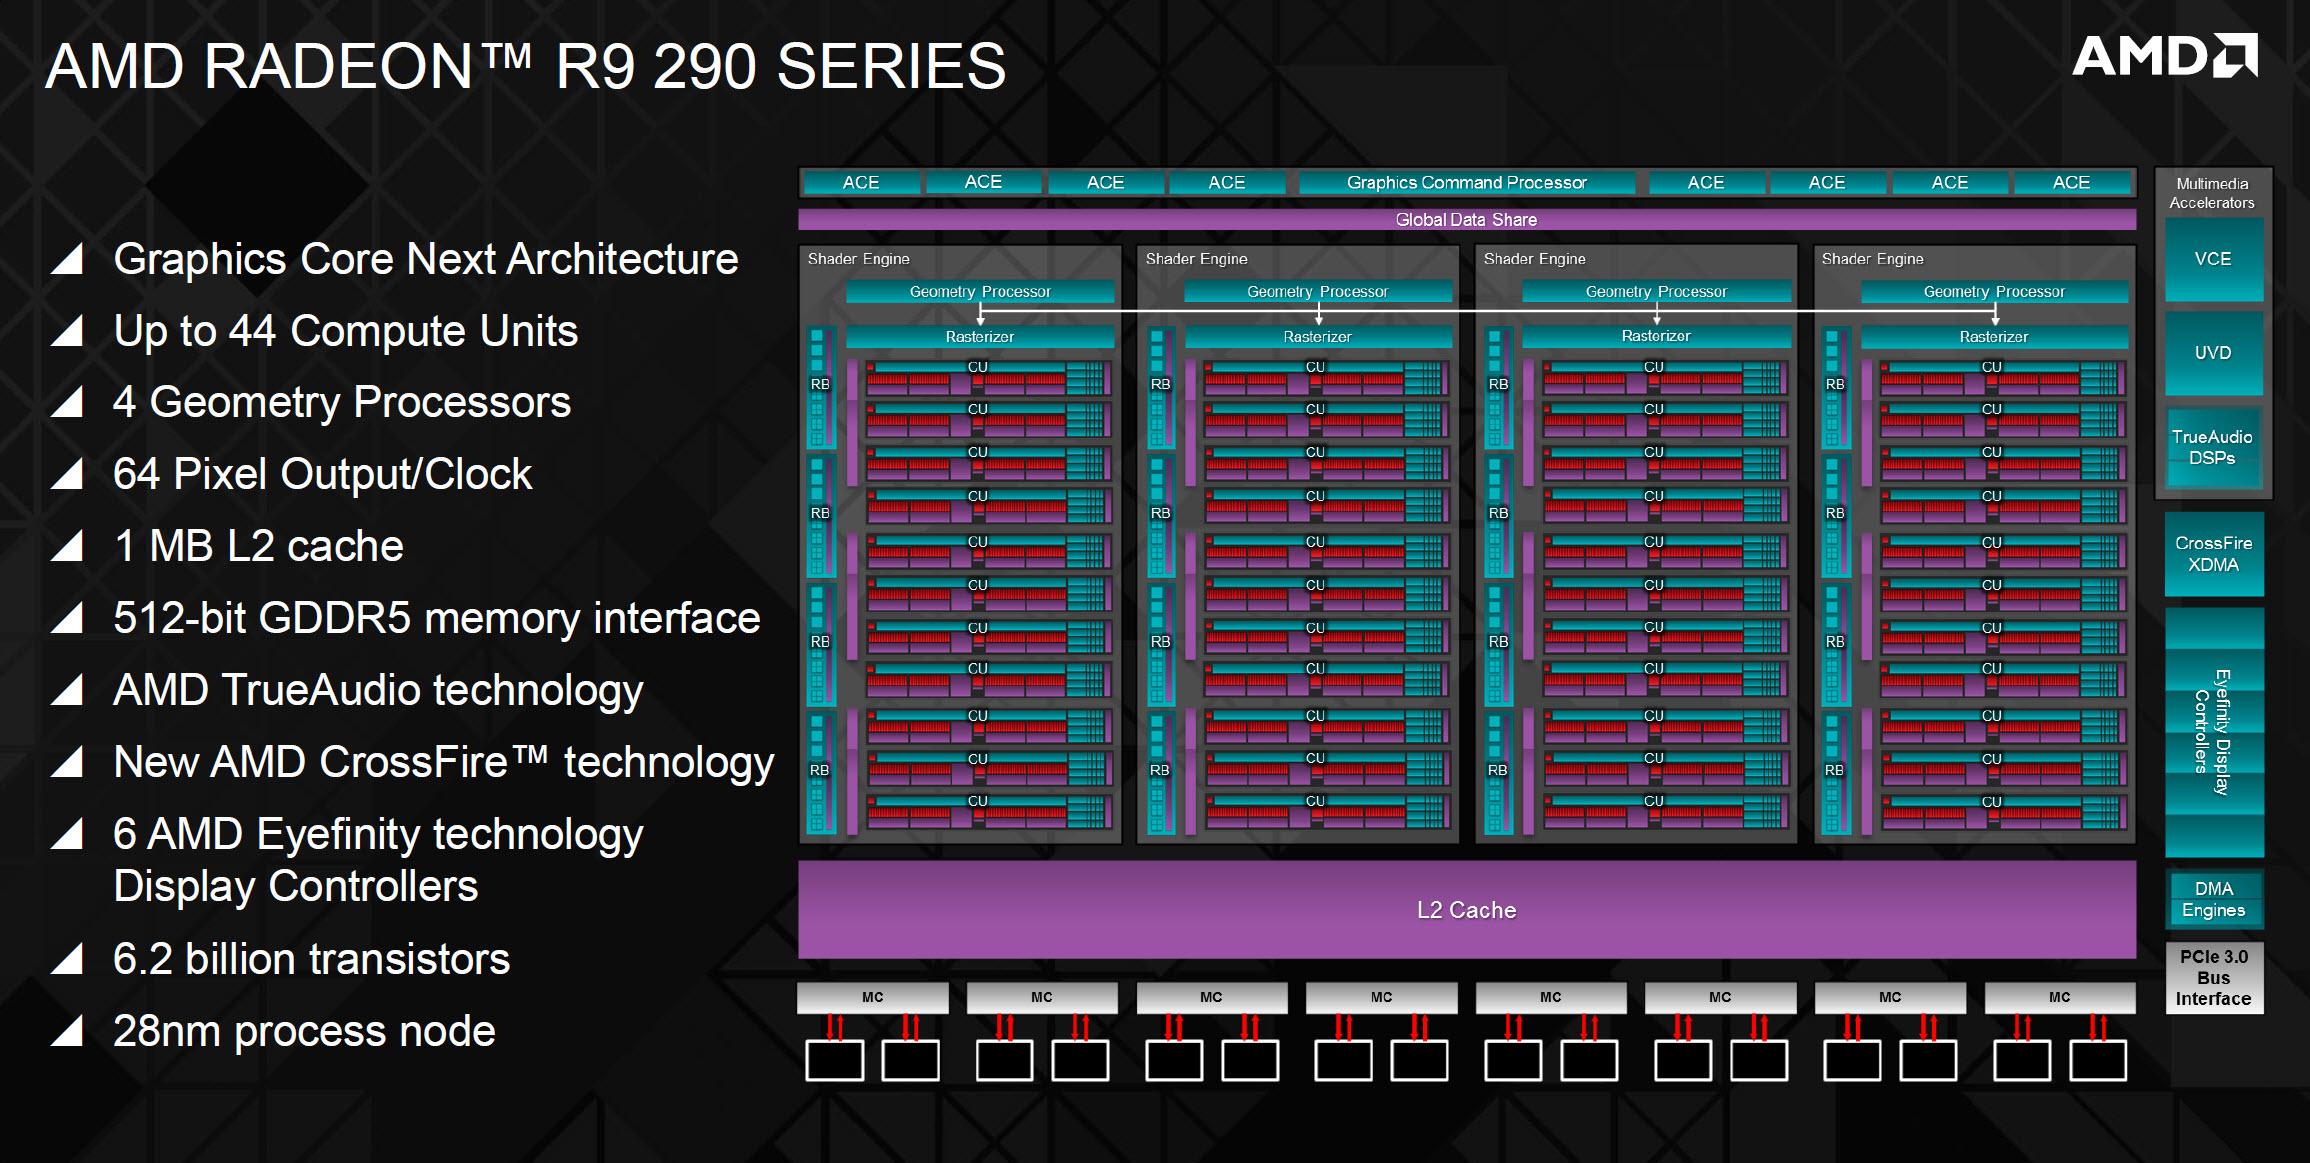 Amd Officially Launches The Radeon R9 290x Hawaii Gpu